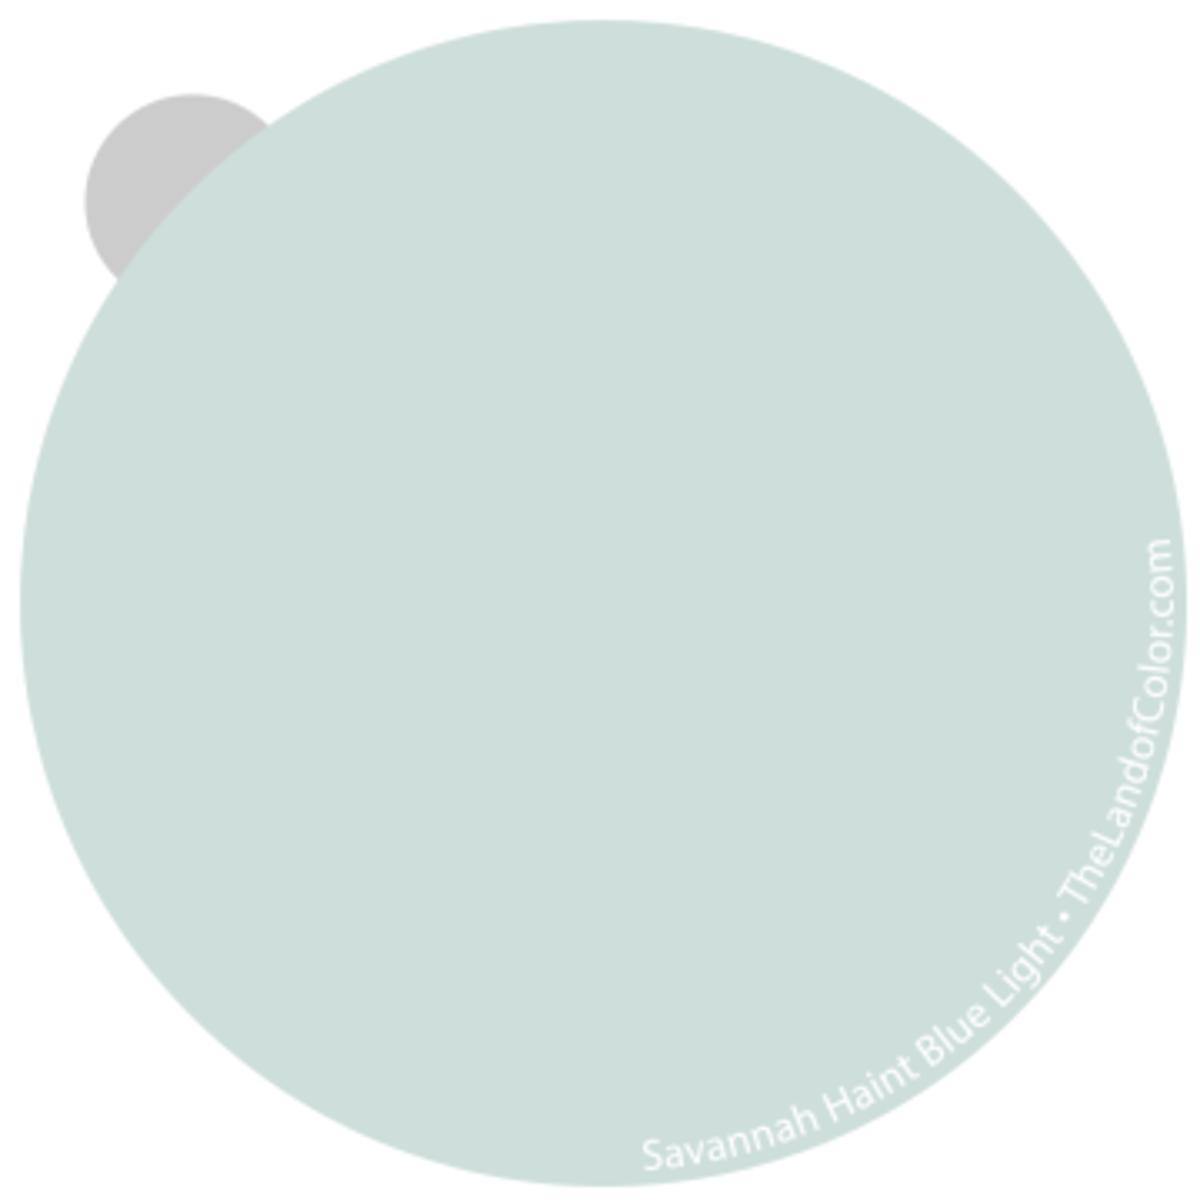 Savannah Haint Blue - Light Strong edge of greenes